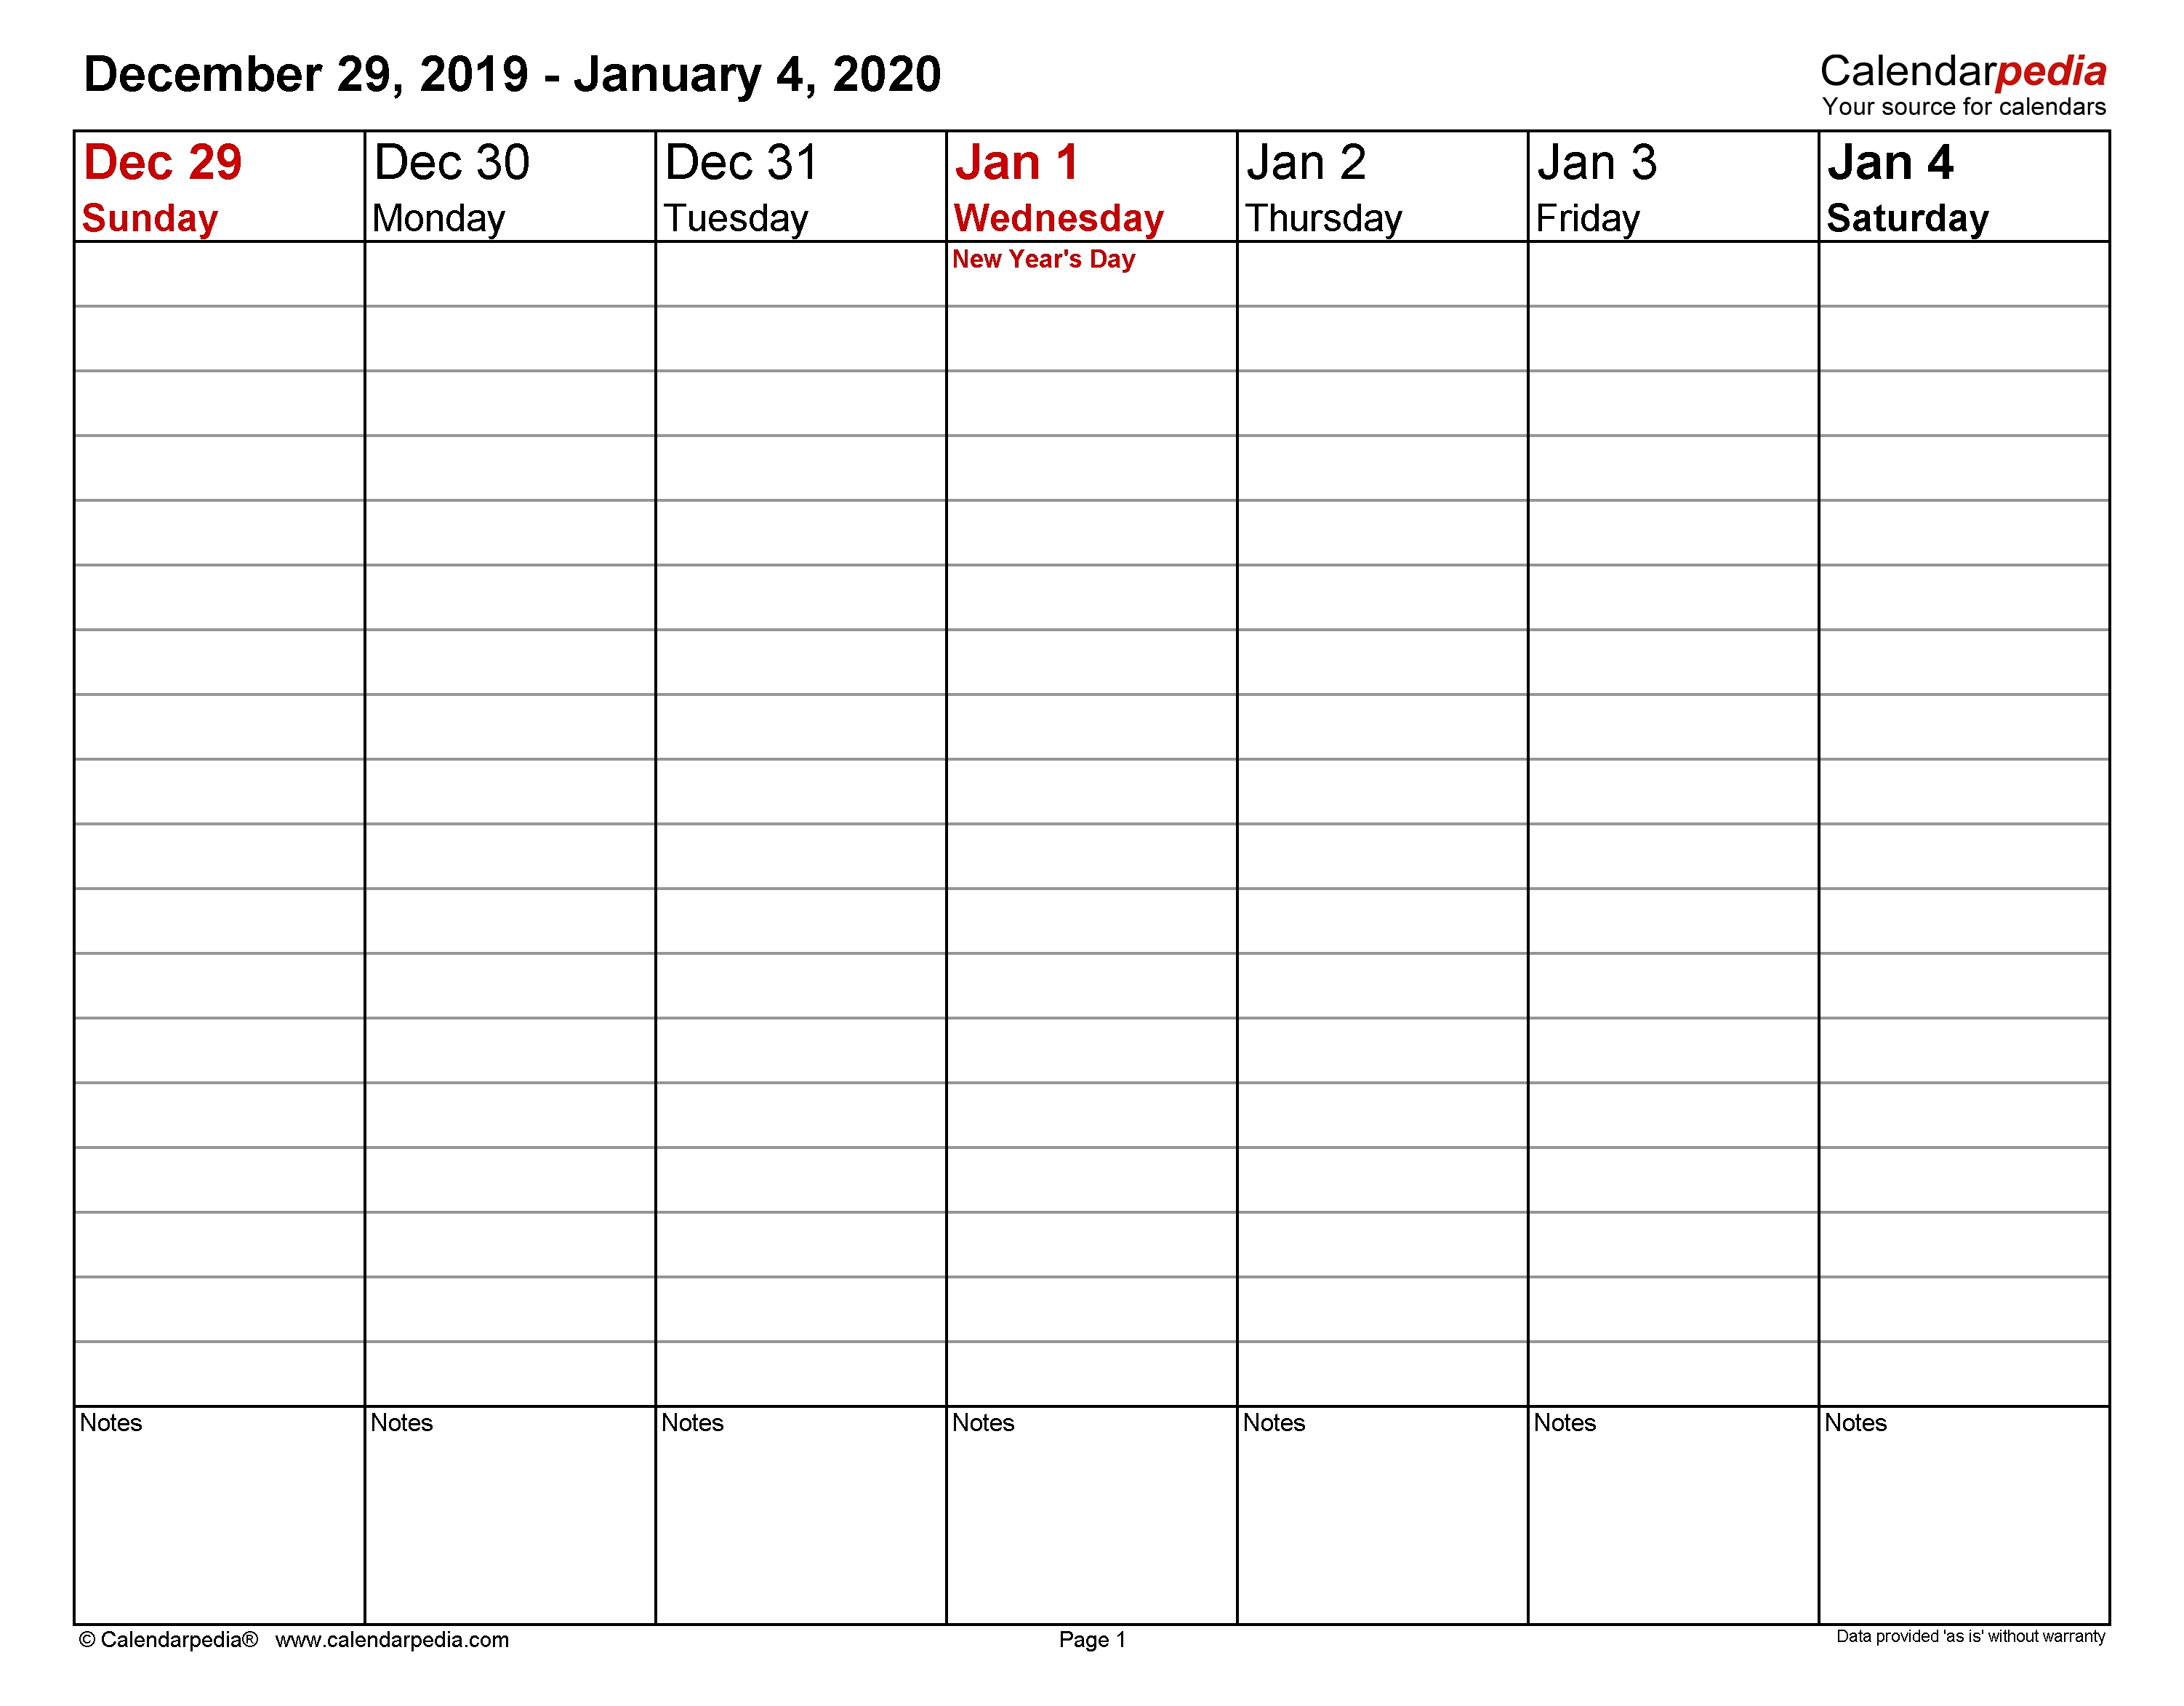 Weekly Calendars 2020 For Word - 12 Free Printable Templates Calendar Template Week View